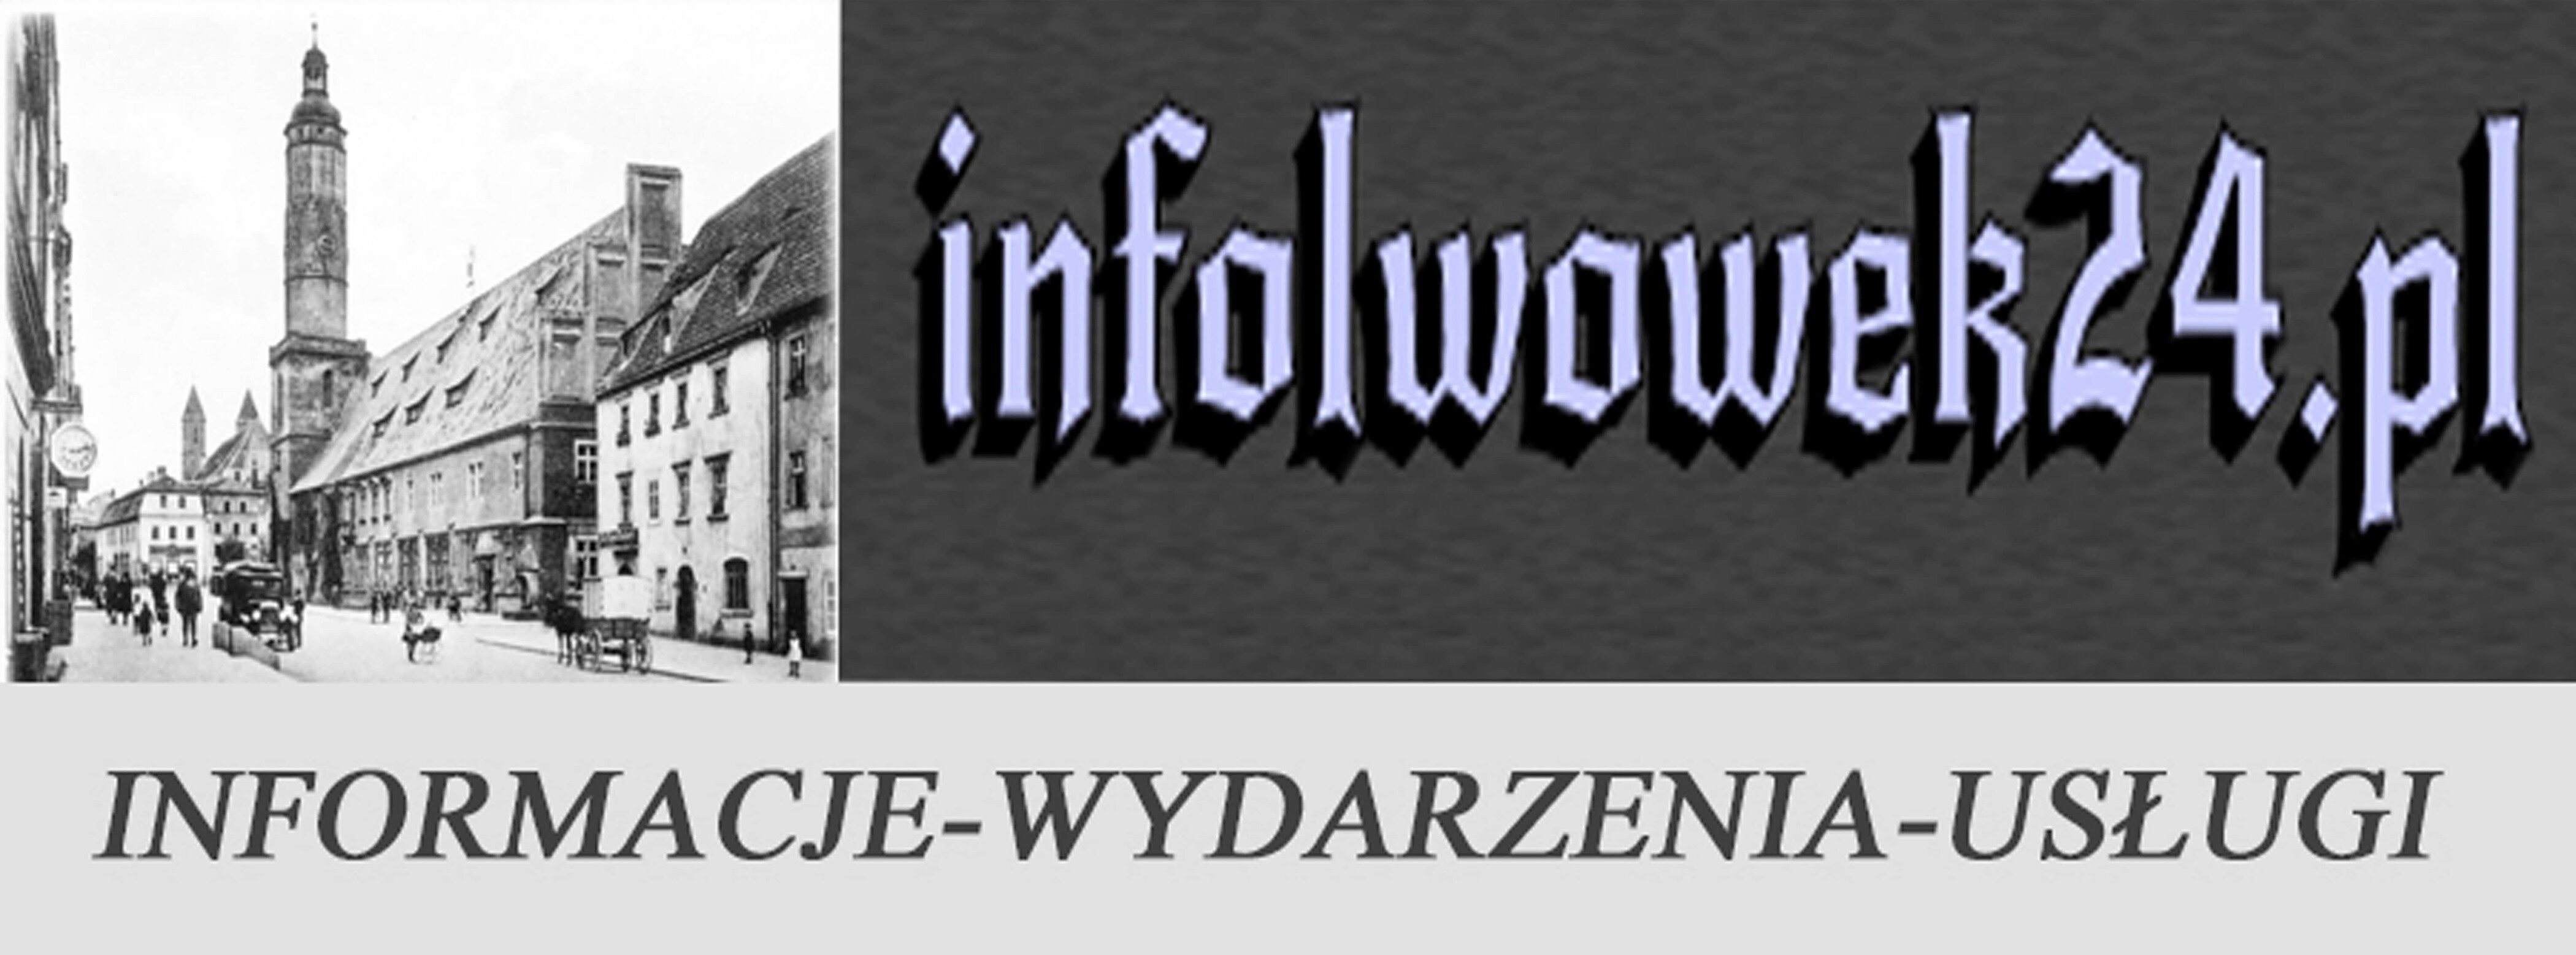 infolwowek24